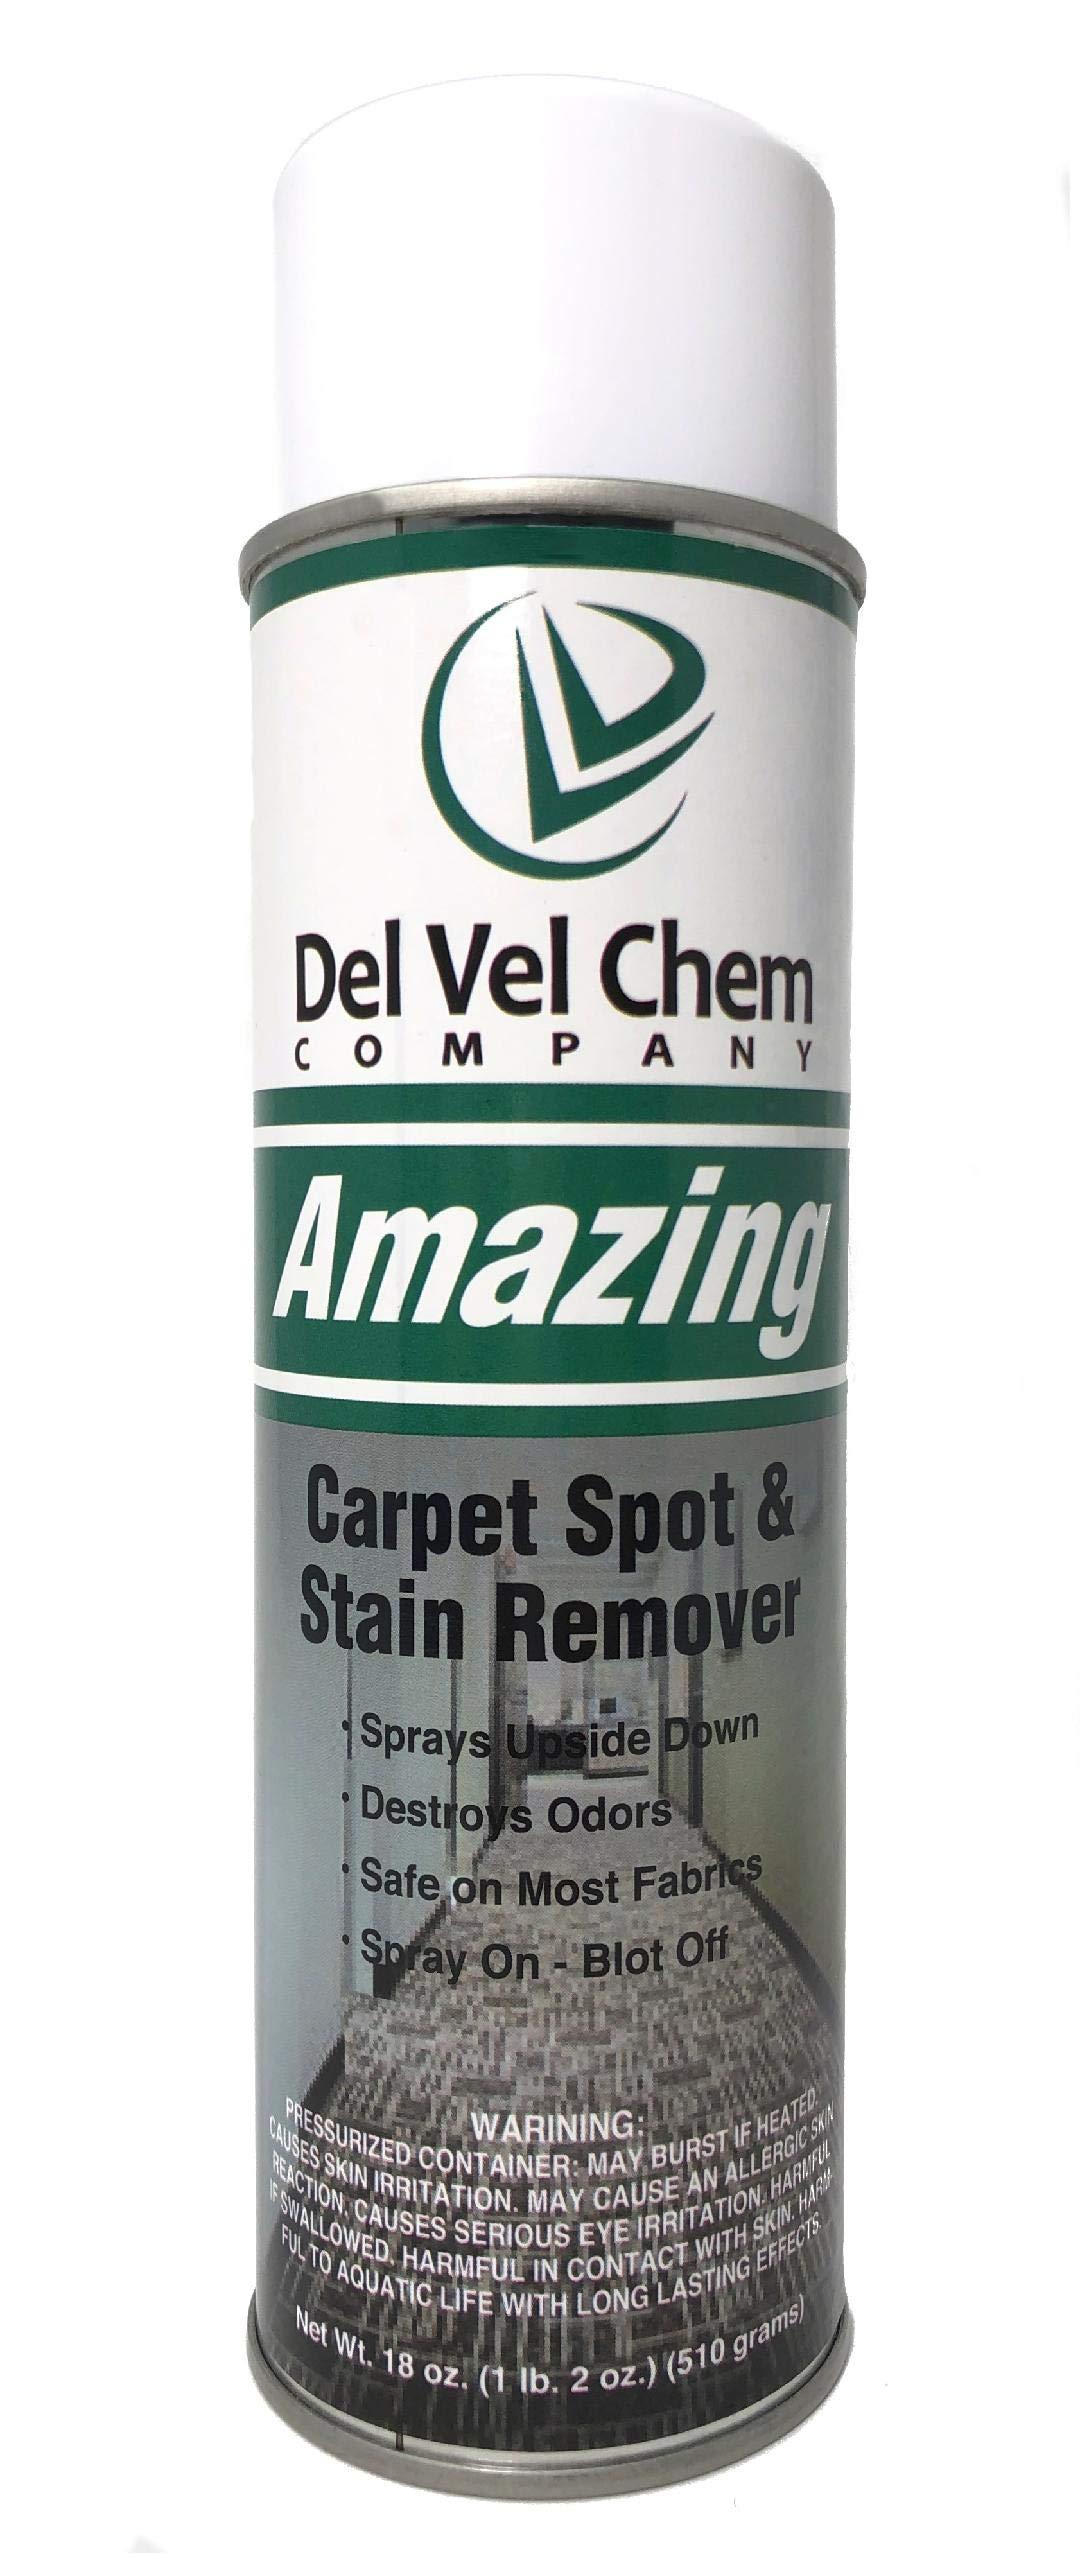 Del Vel Chem Amazing Carpet Spot and Stain Remover 18 oz Aerosol Case (12 Pack)